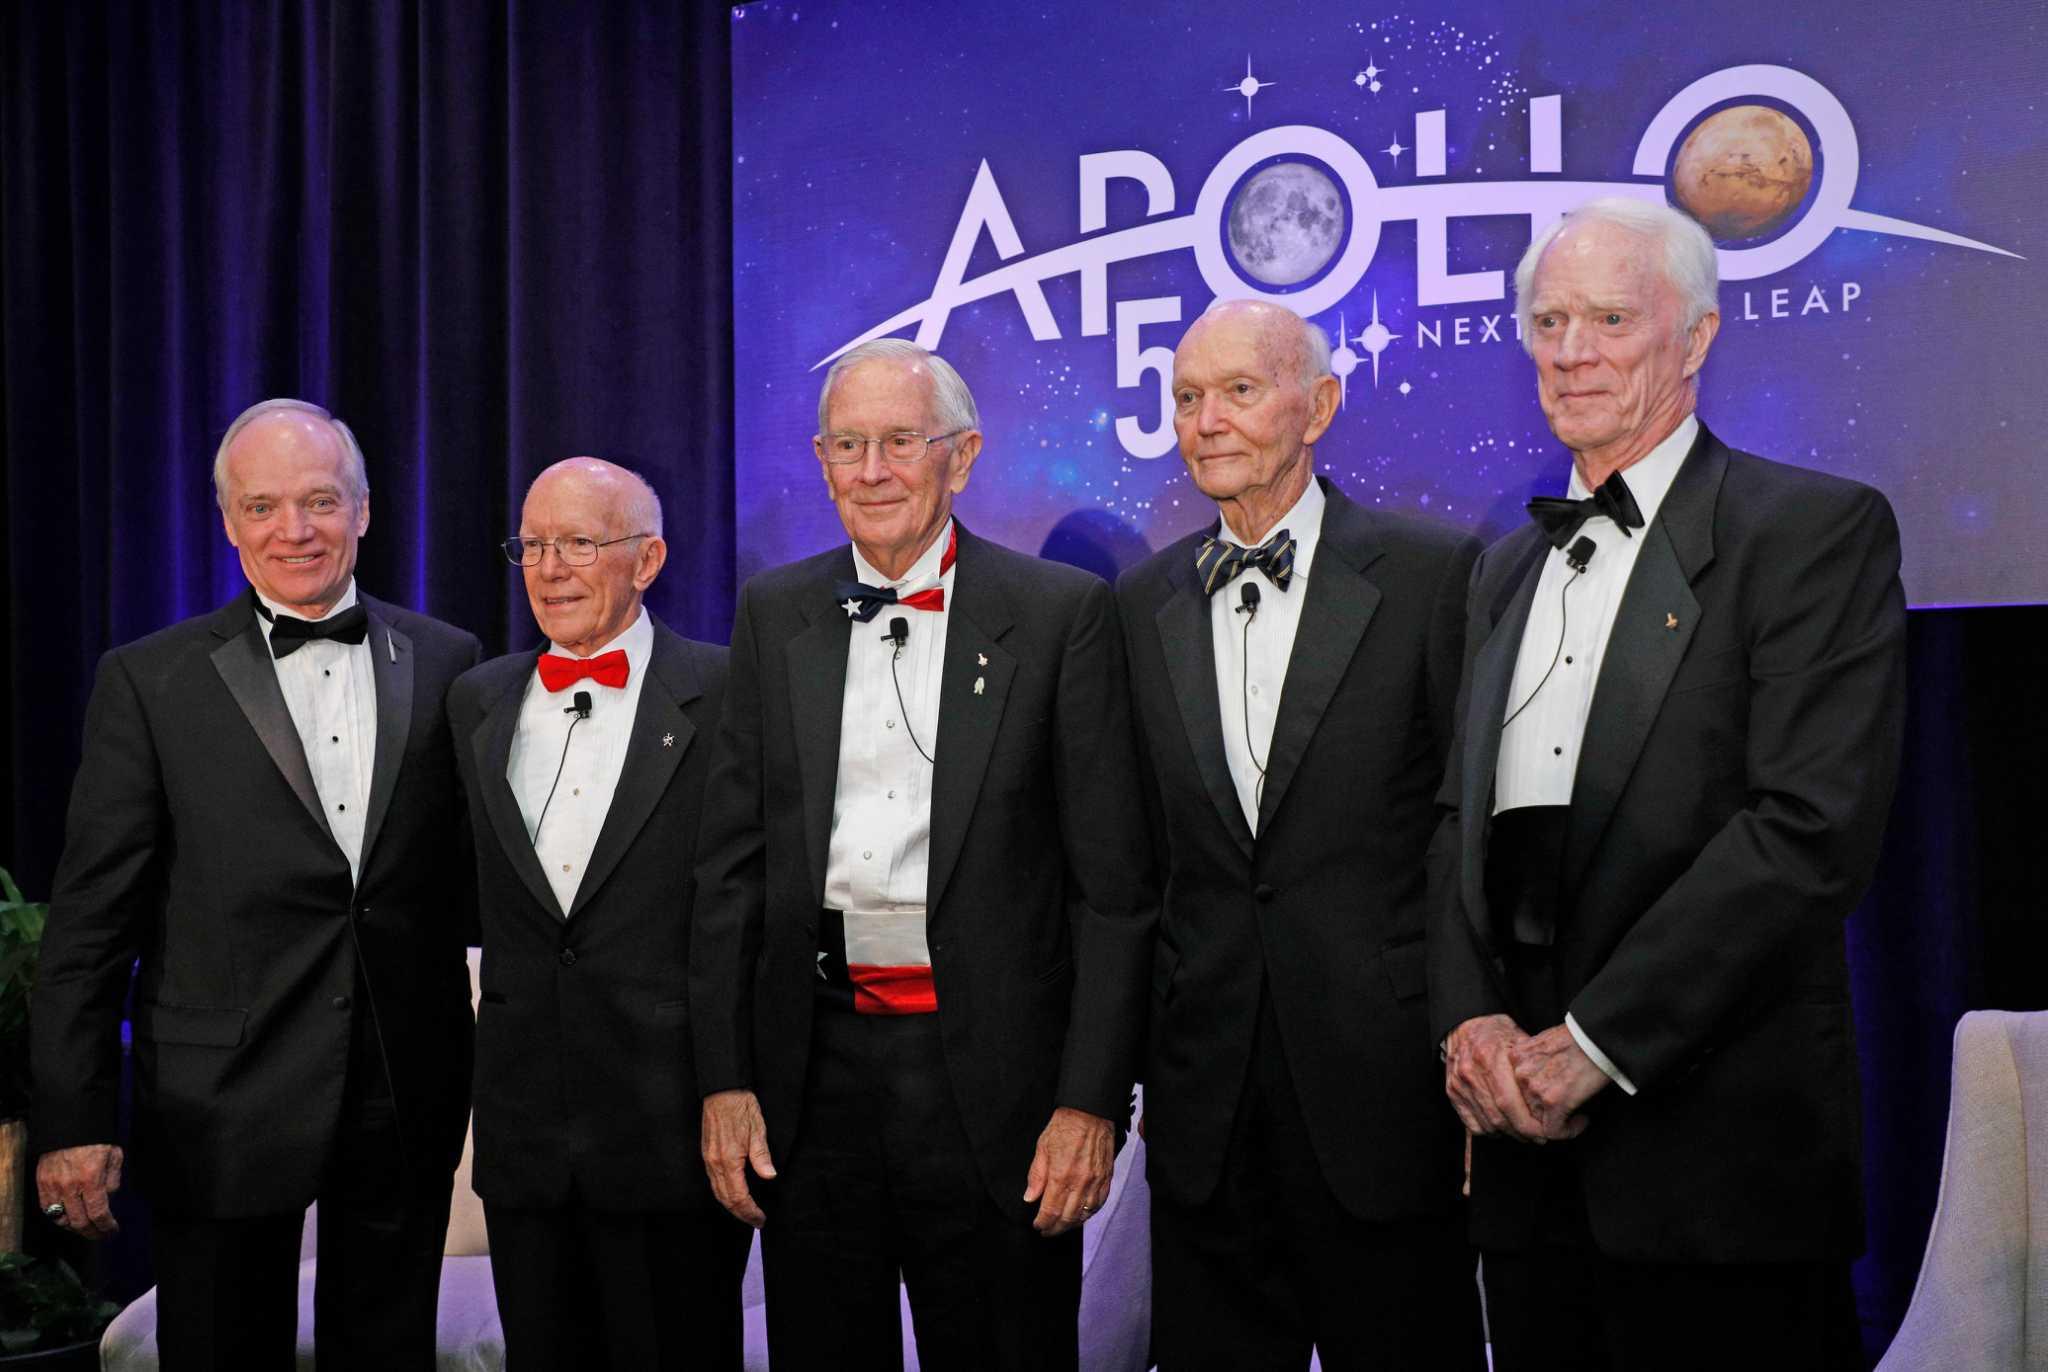 Apollo 16 astronaut Charlie Duke named 2020 Texan of the Year